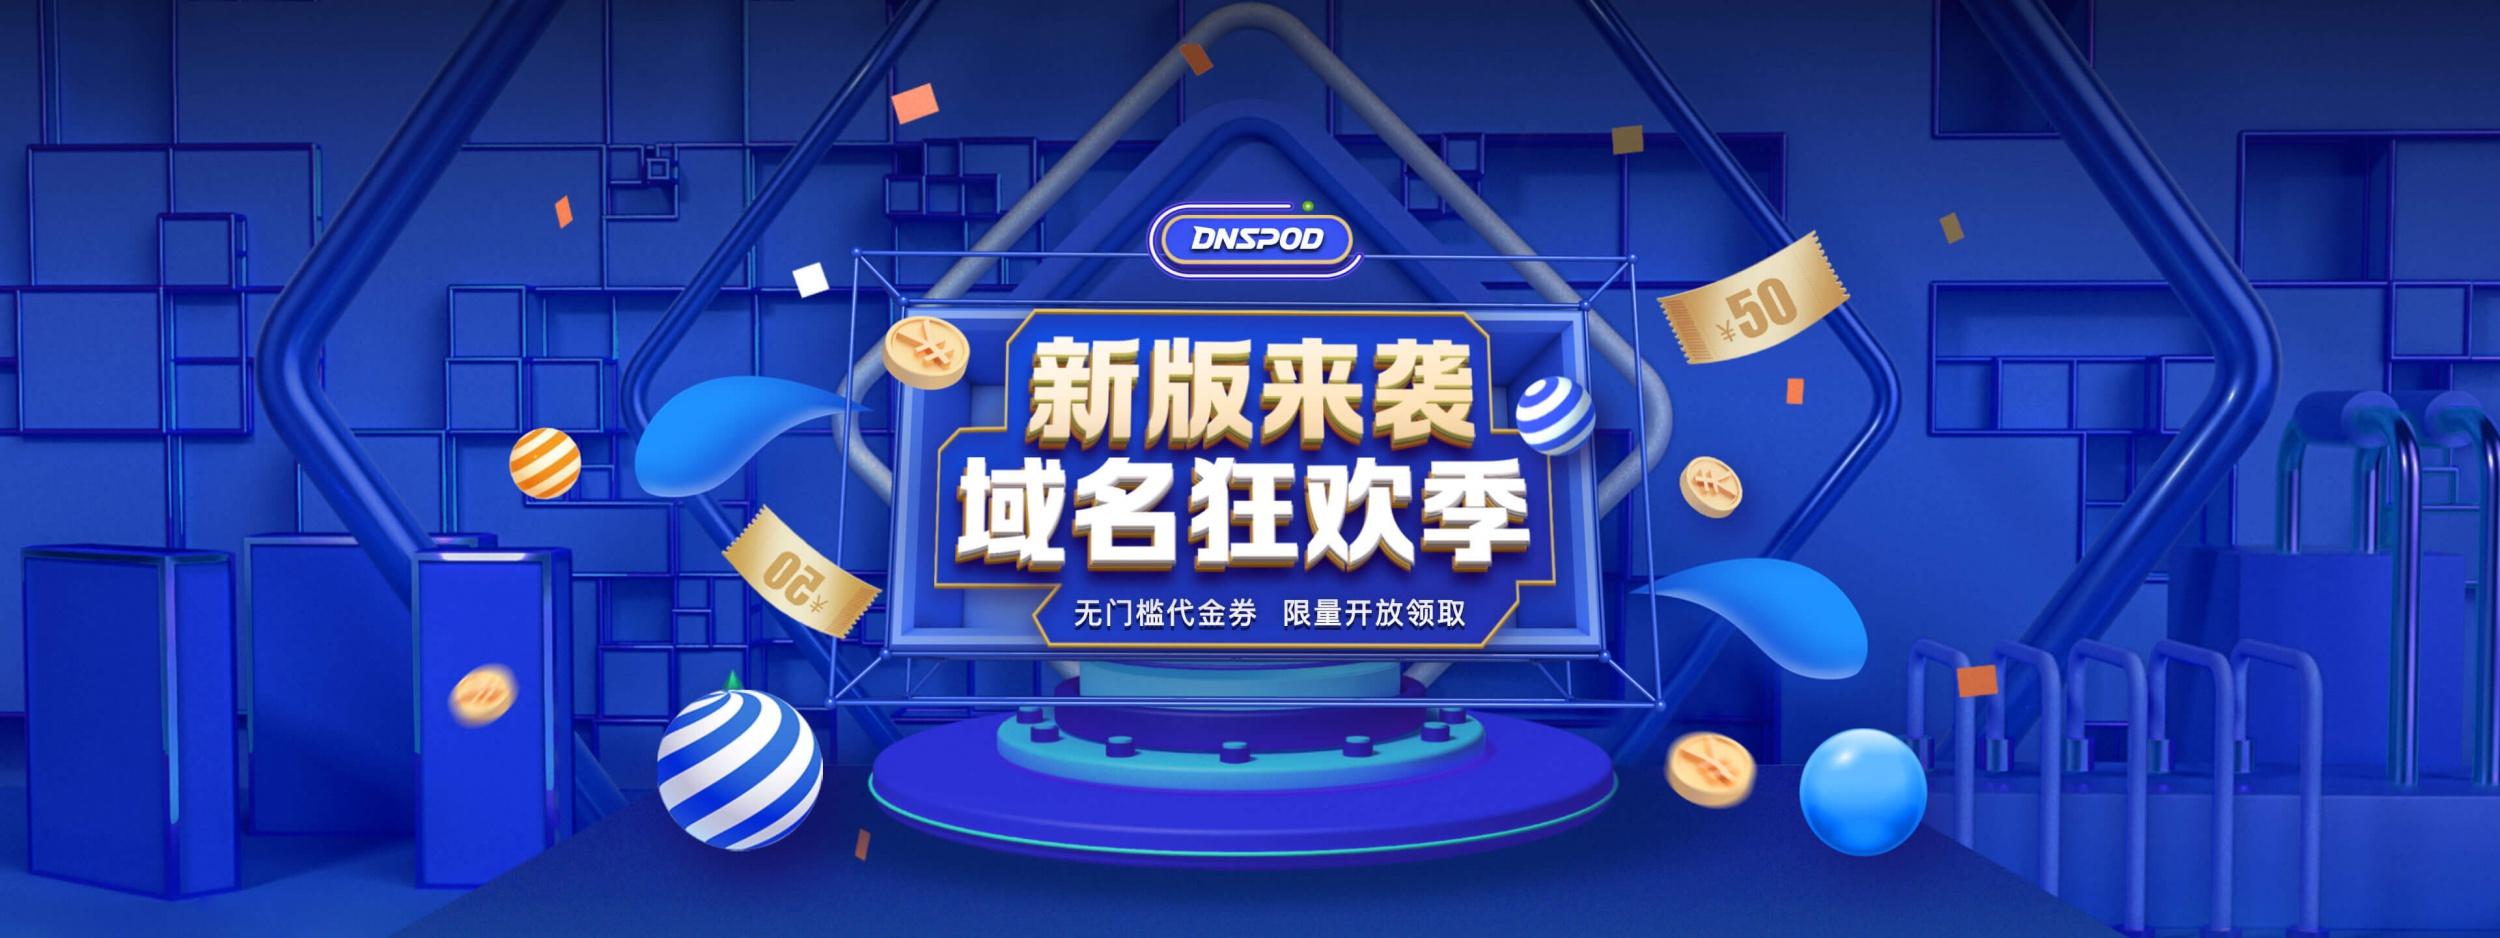 DNSPod 全新版本发布,域名狂欢季来袭!